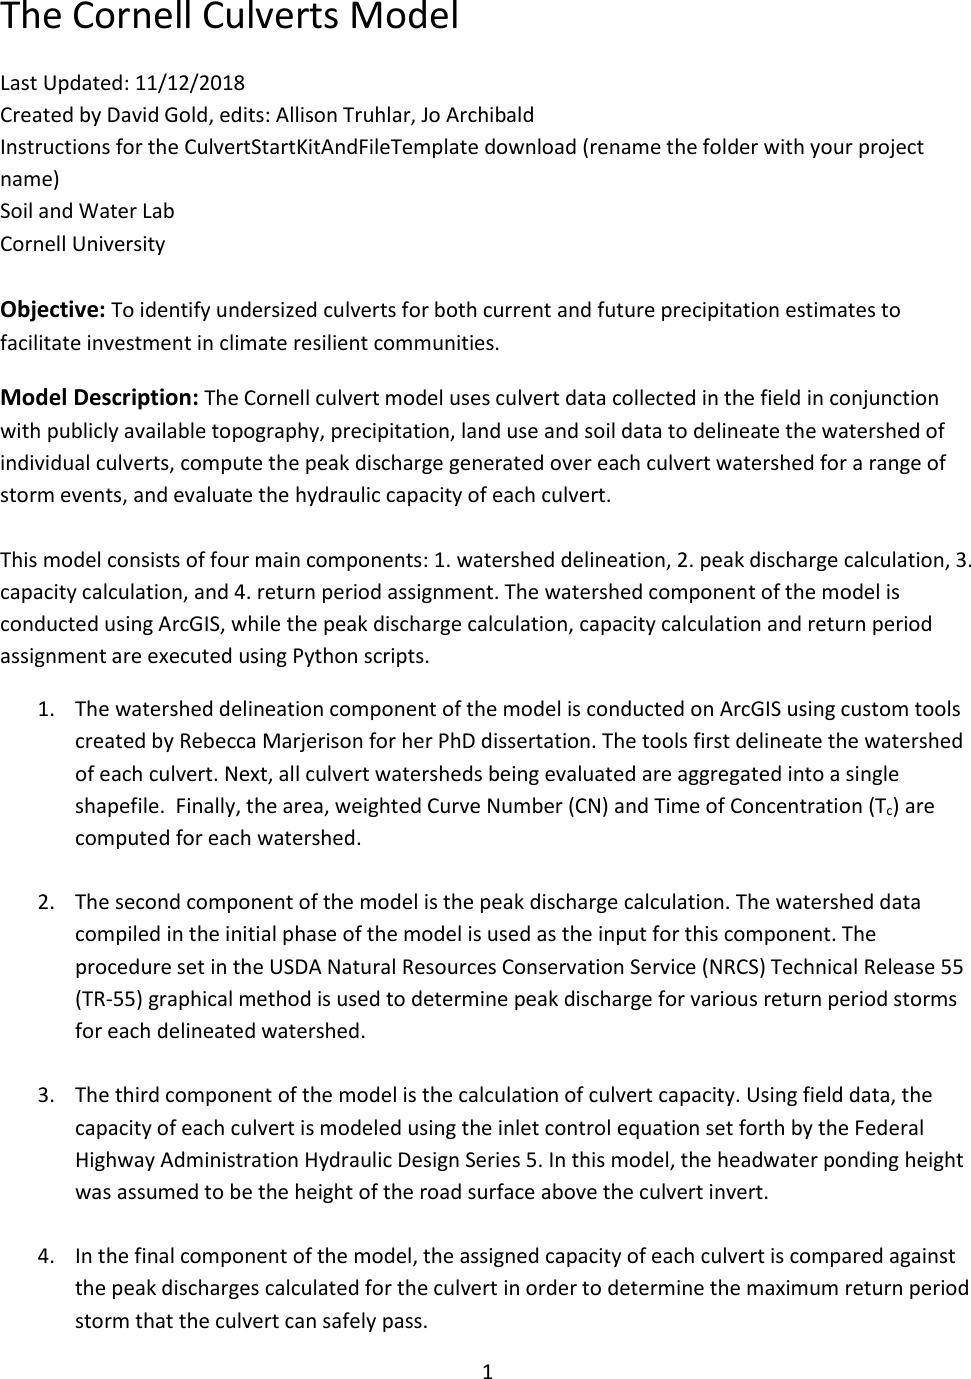 Cornell Culverts Instructions